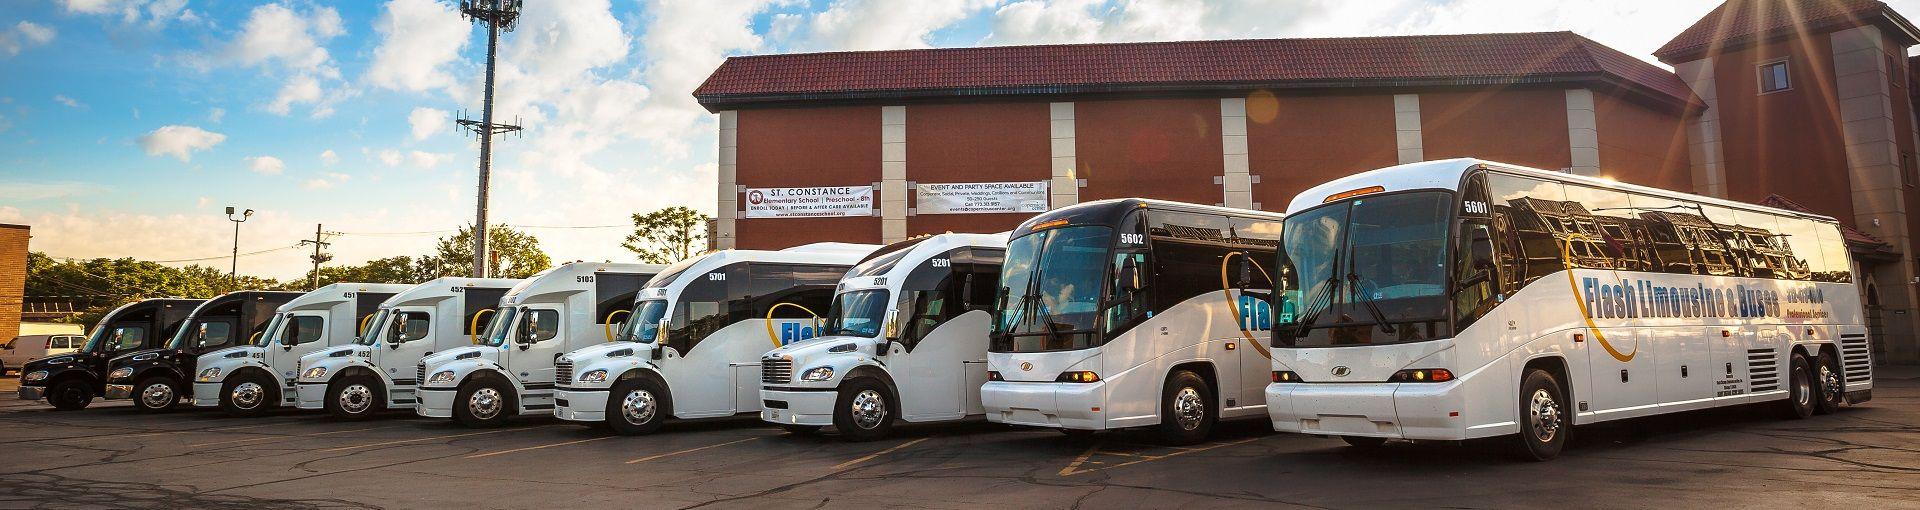 Coach Bus Transportation Chicago Motor Coach Bus and Shuttle Bus Transportation